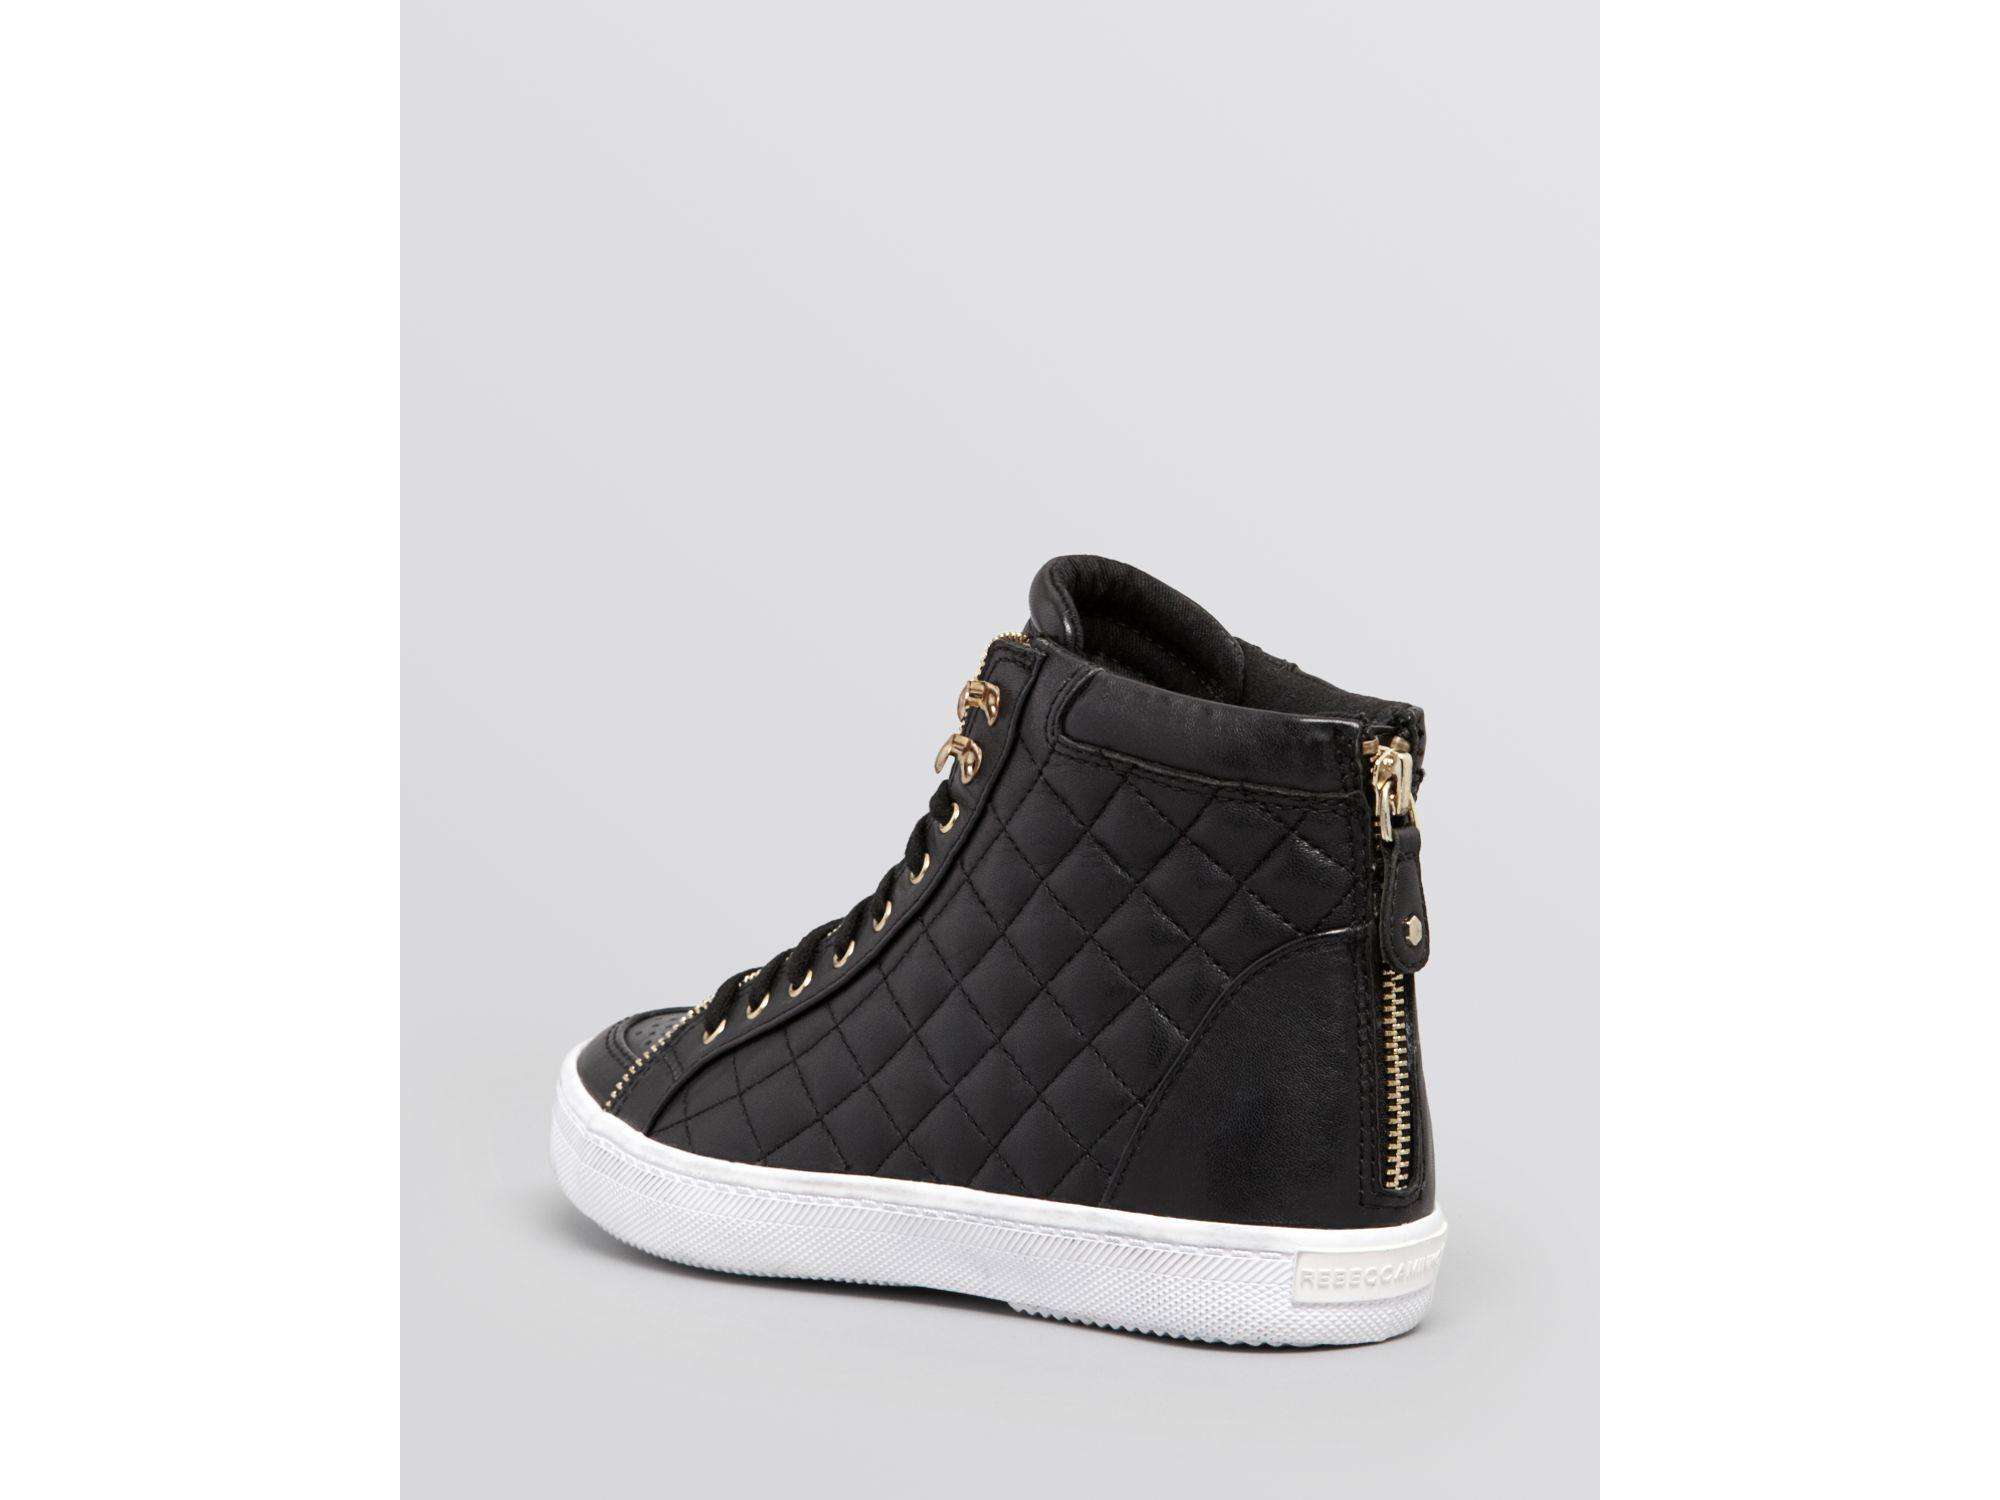 FOOTWEAR - High-tops & sneakers Rebecca Minkoff 4kDt58b